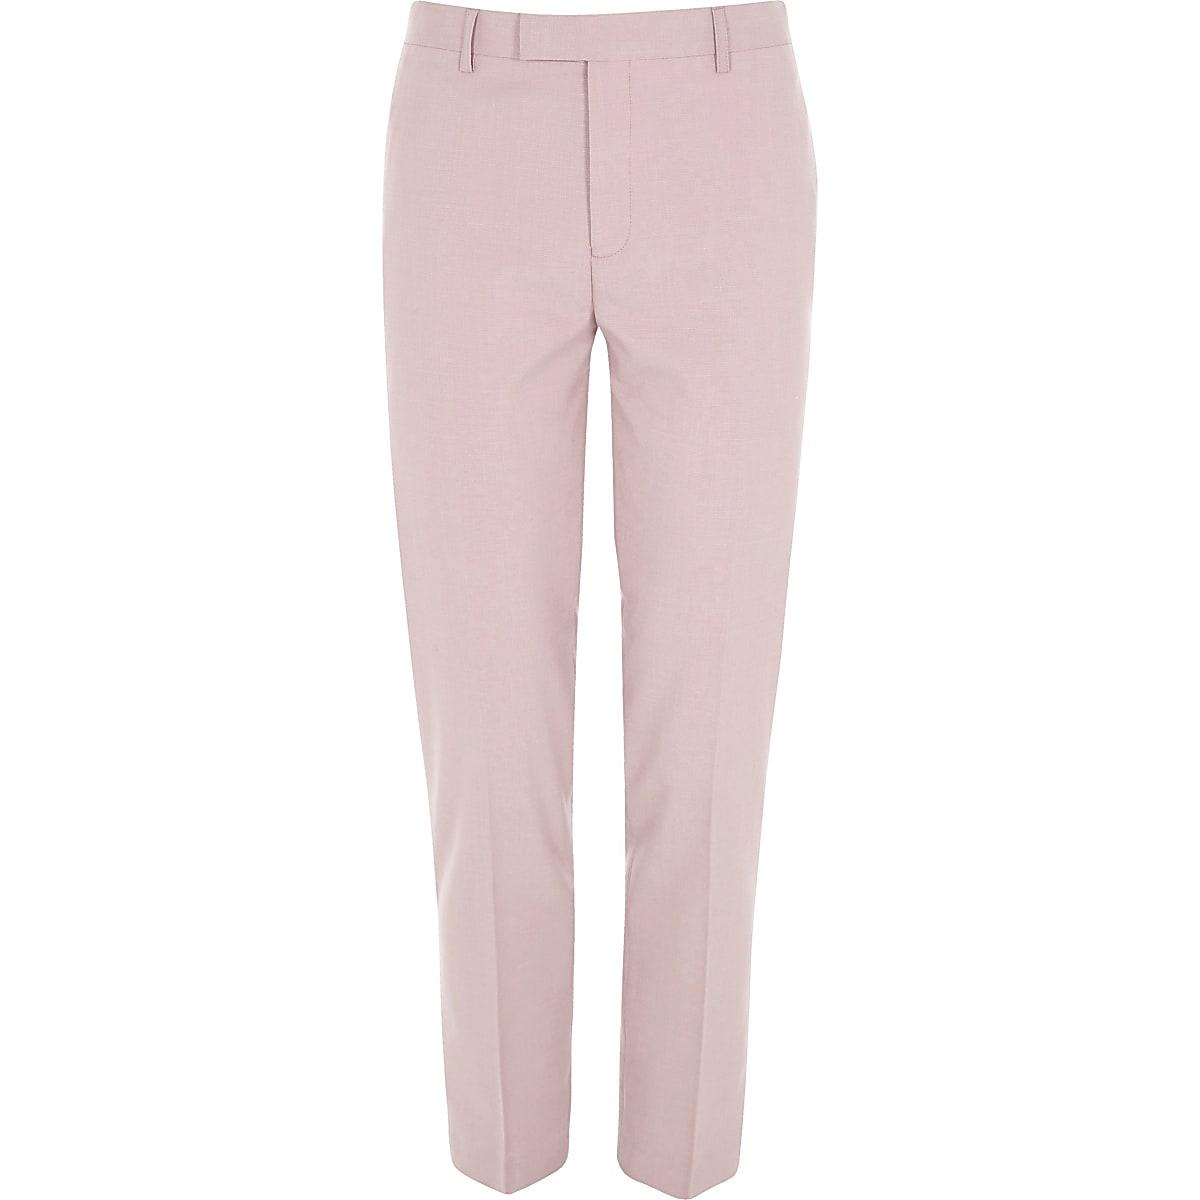 Pink skinny fit suit pants